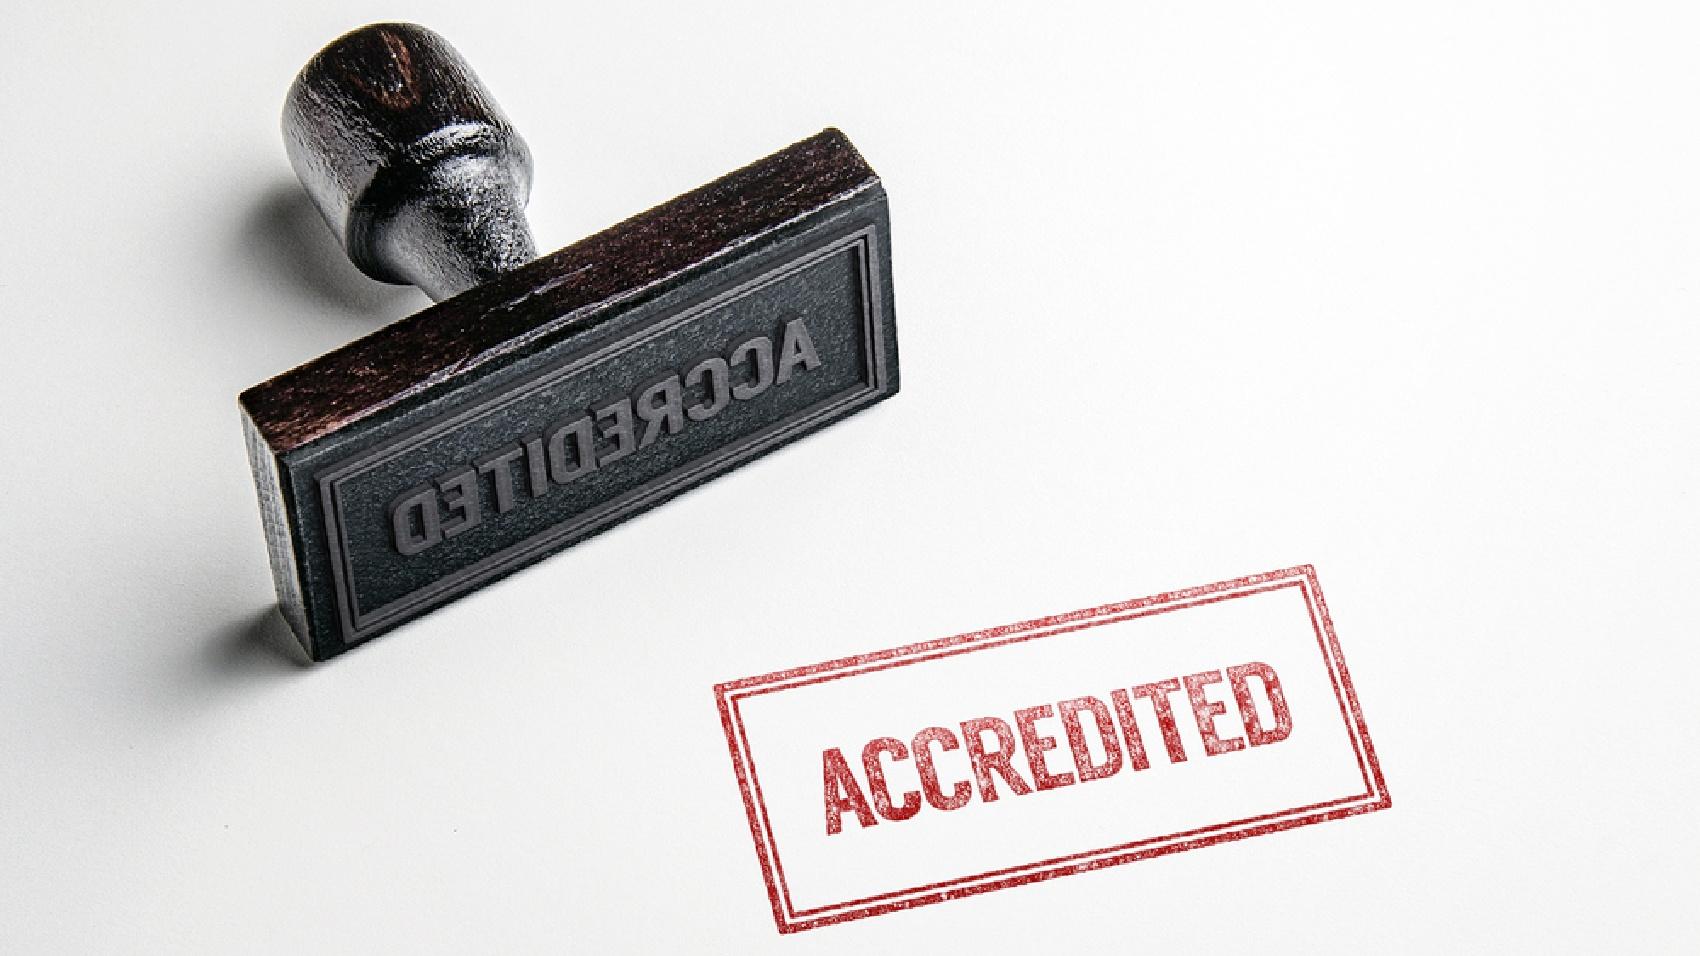 NESA Accredited